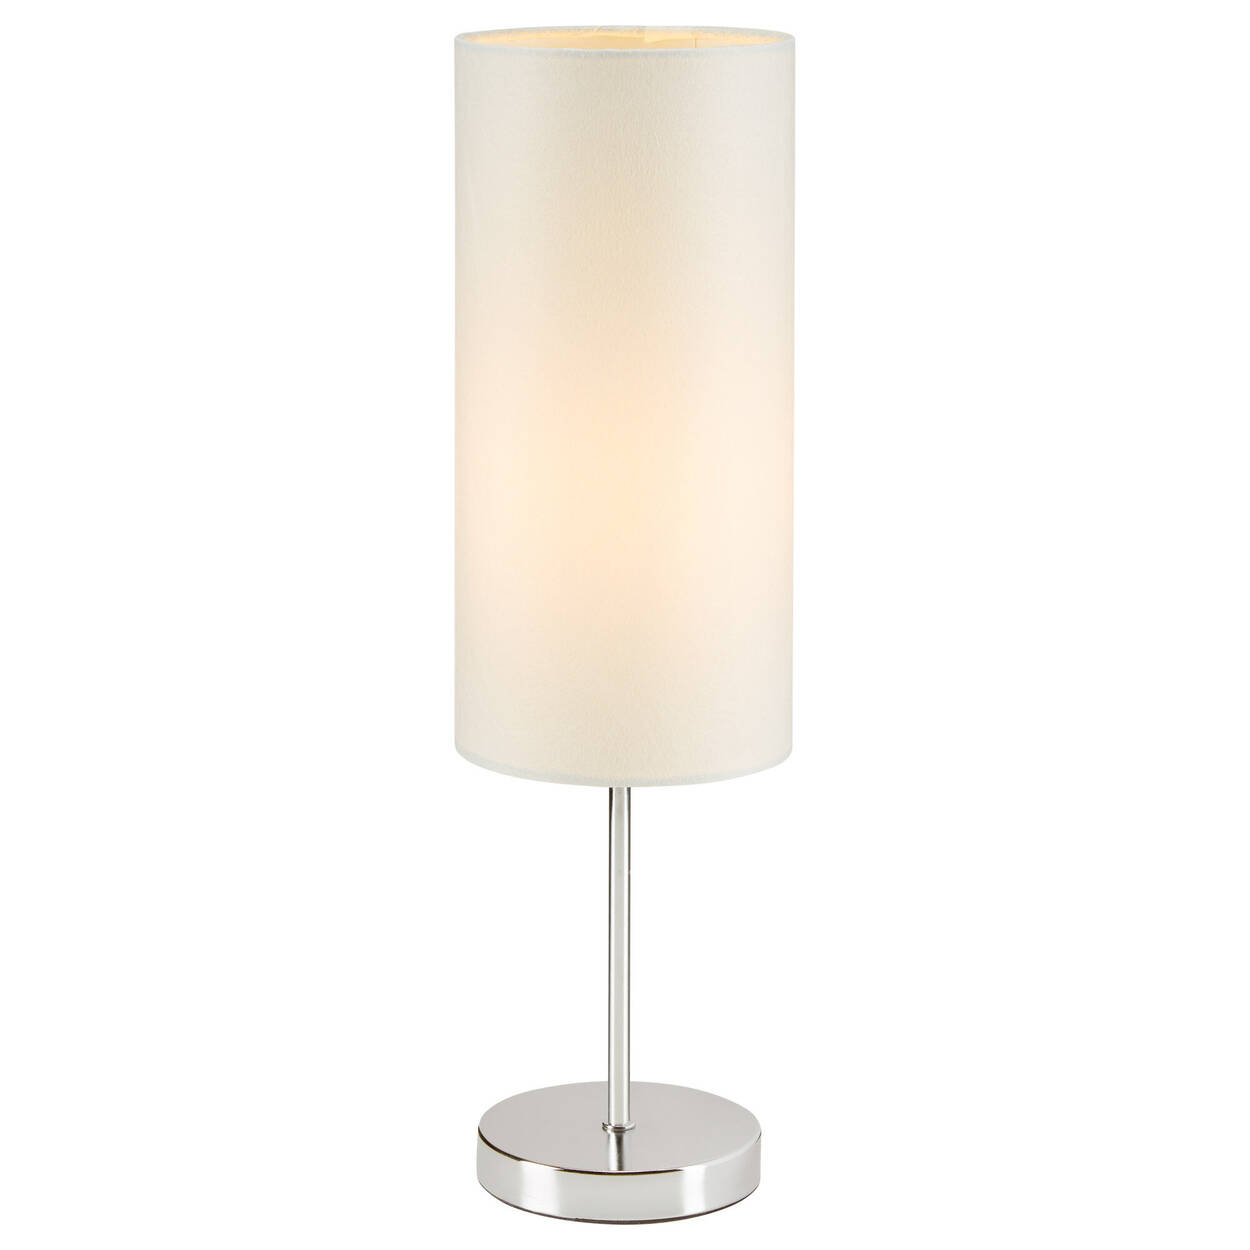 Lampe de table en métal et en satin